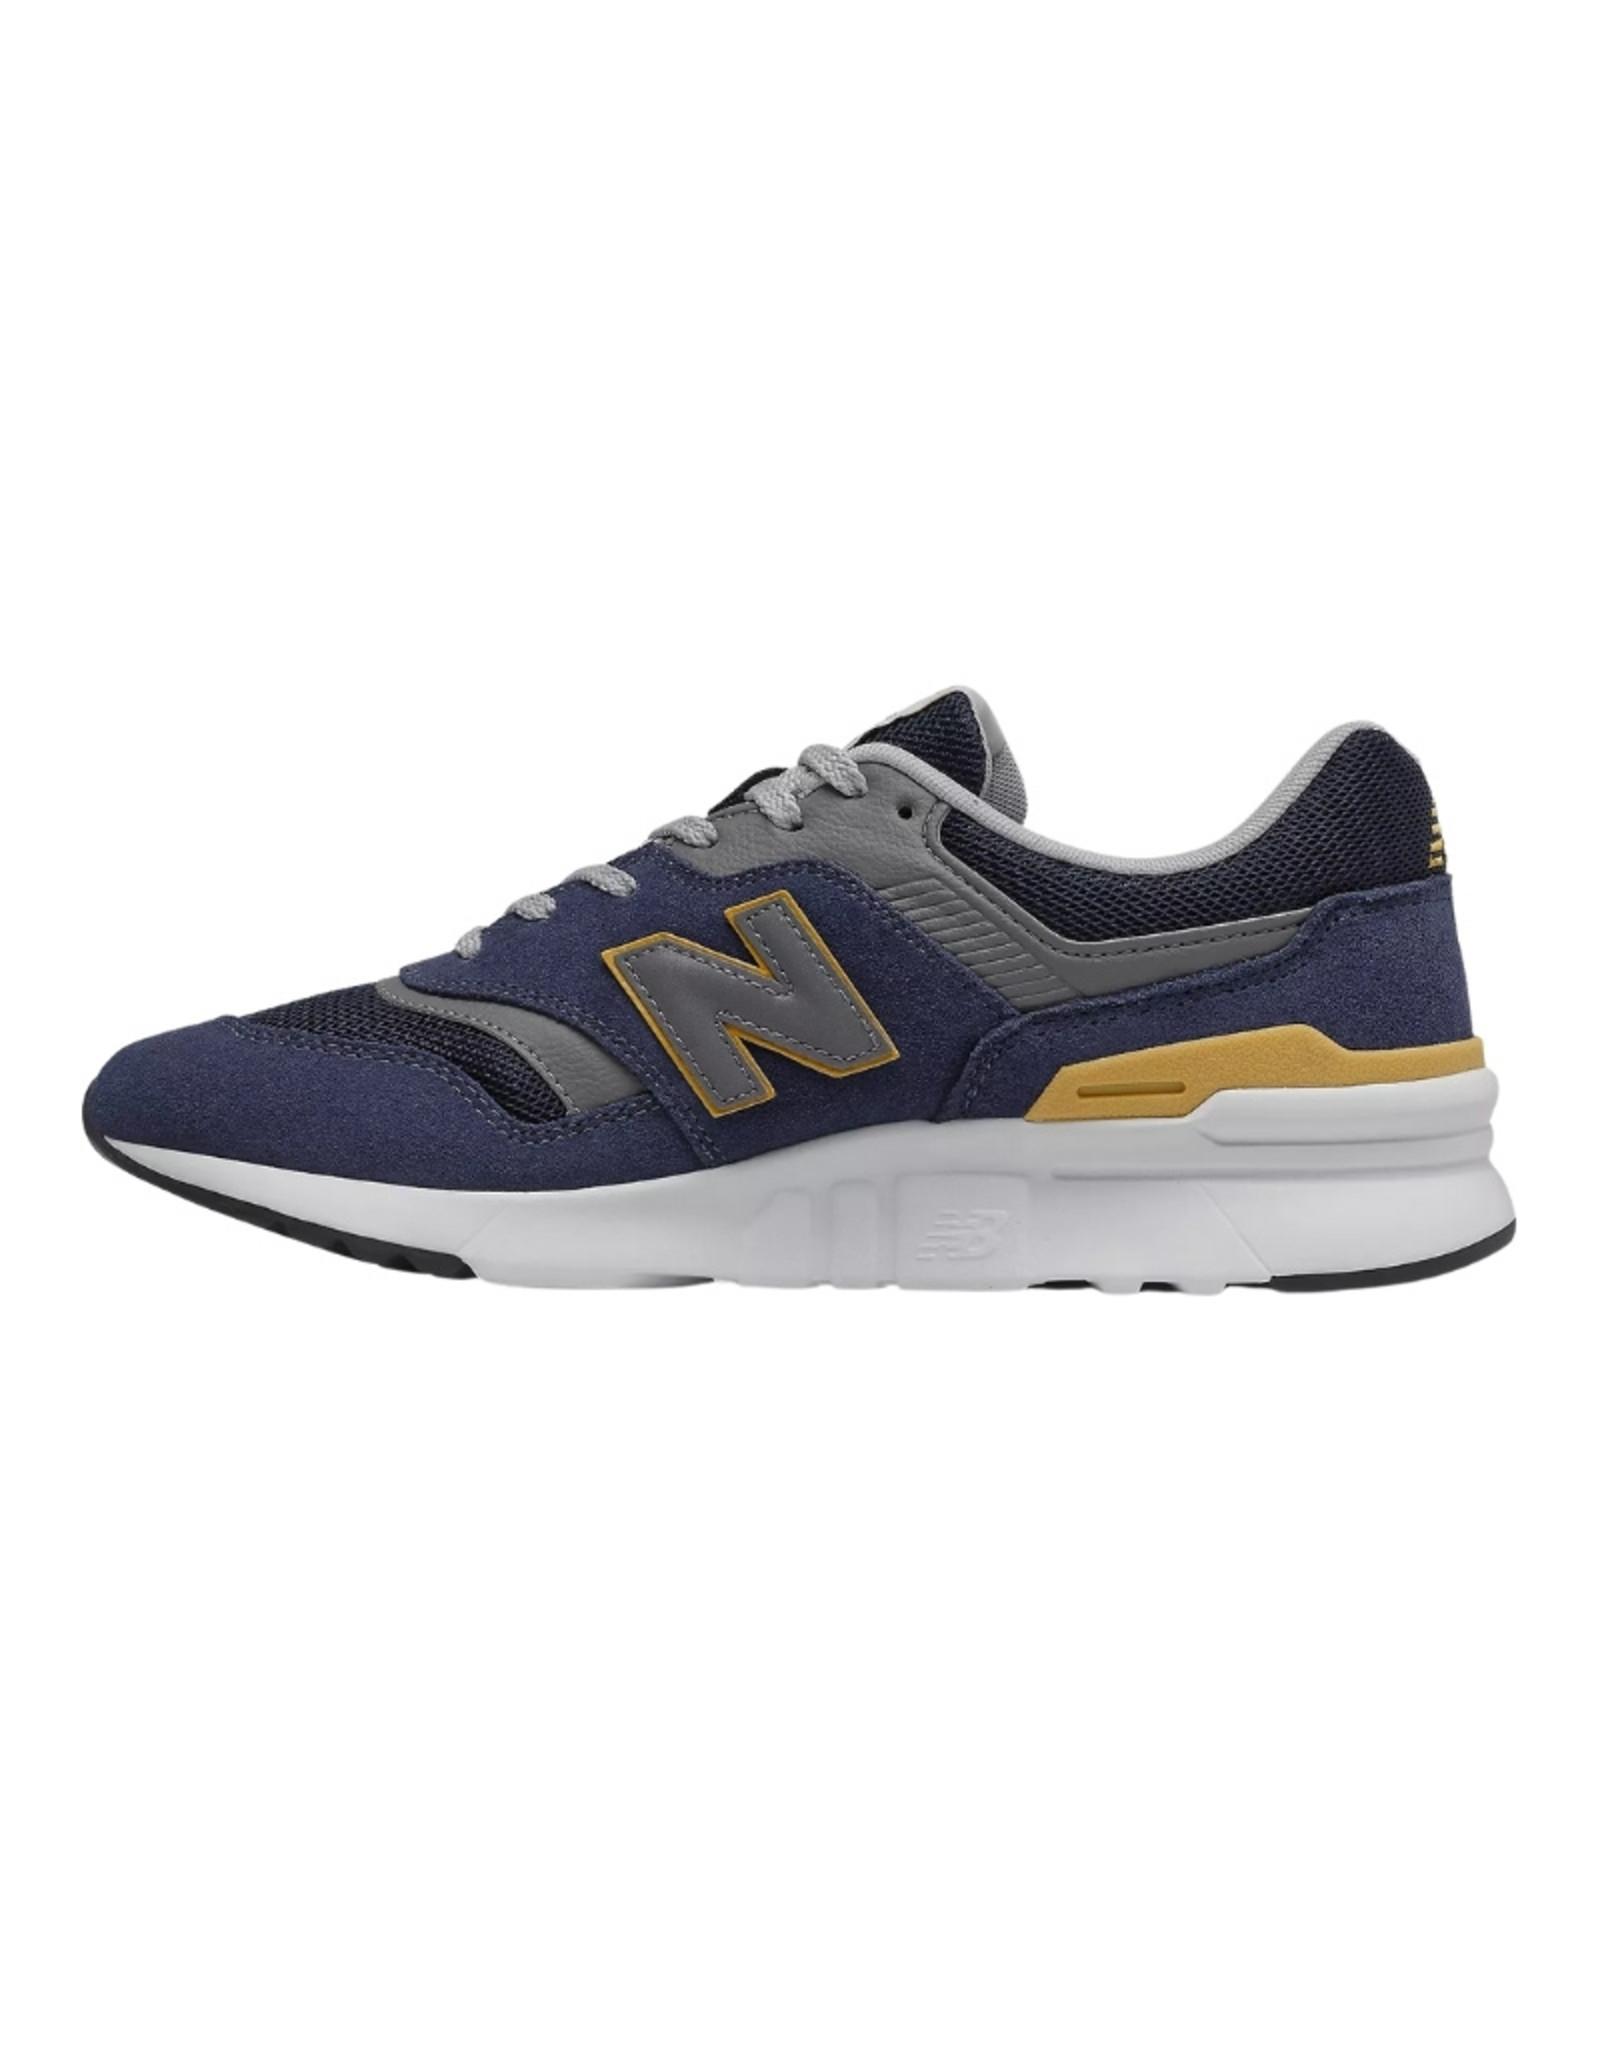 New Balance - CM997HVG